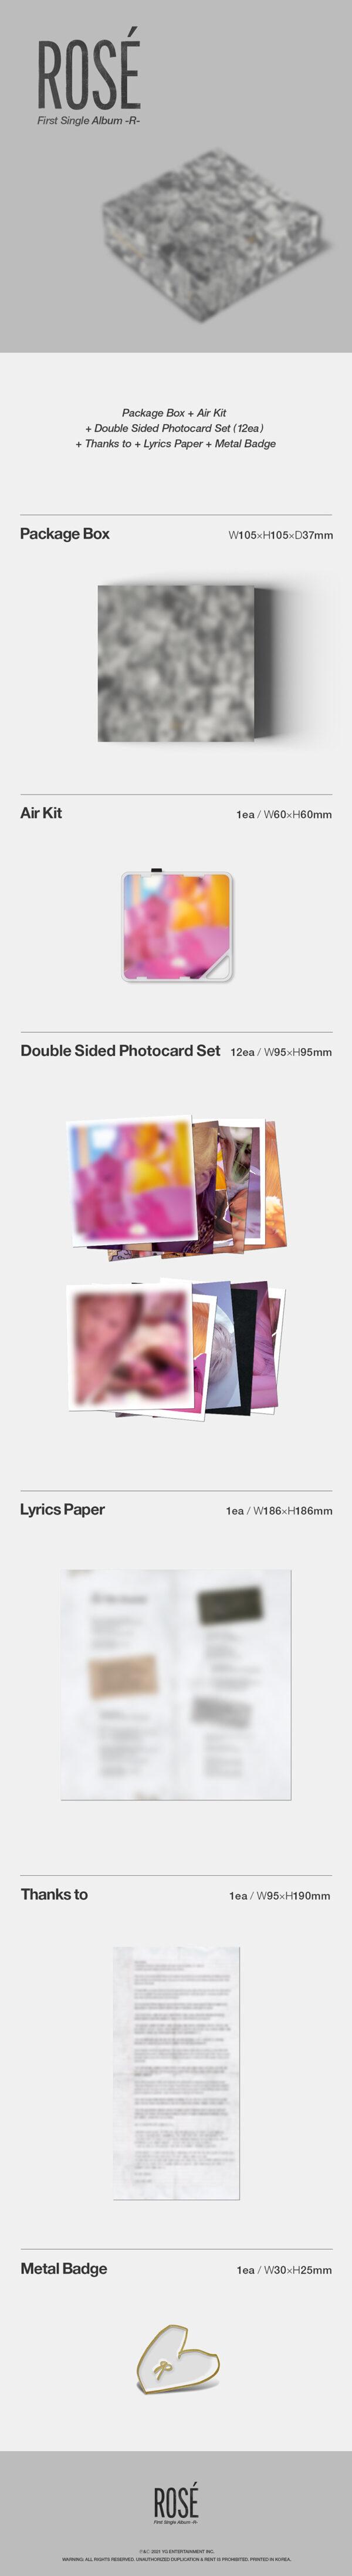 1st Single de Rose BLACKPINK R Kit Album Photocard 1